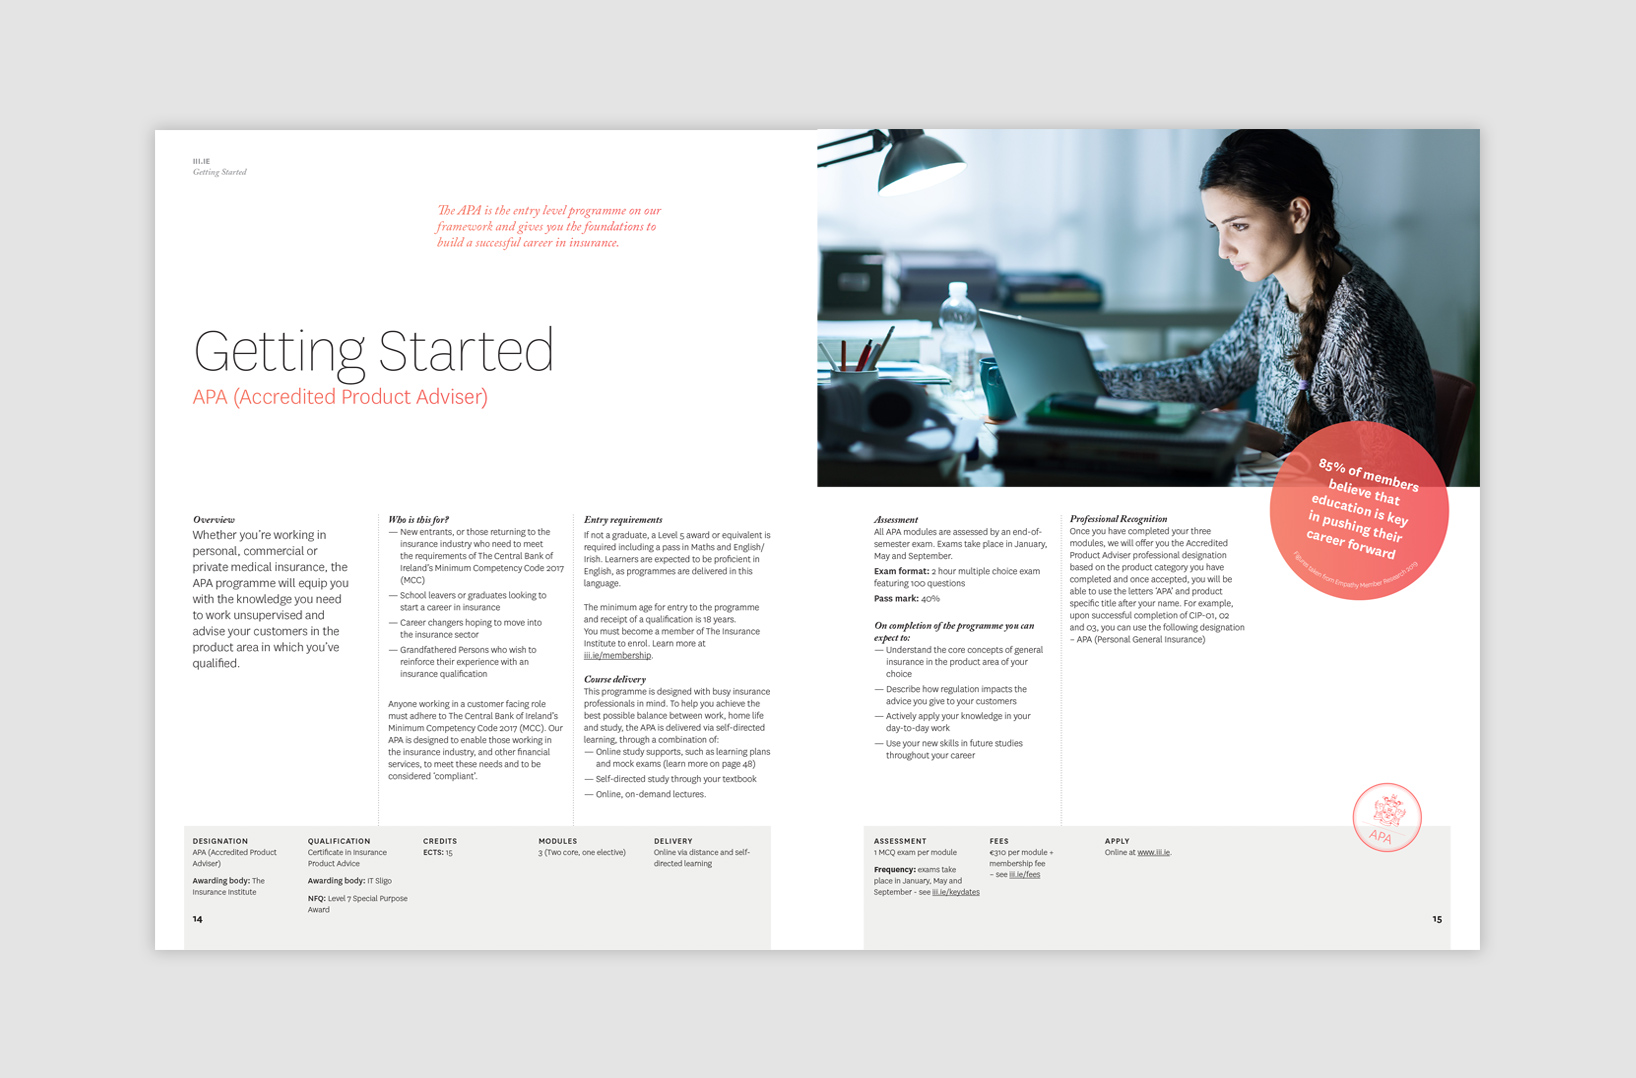 prospectus-spread3.jpg